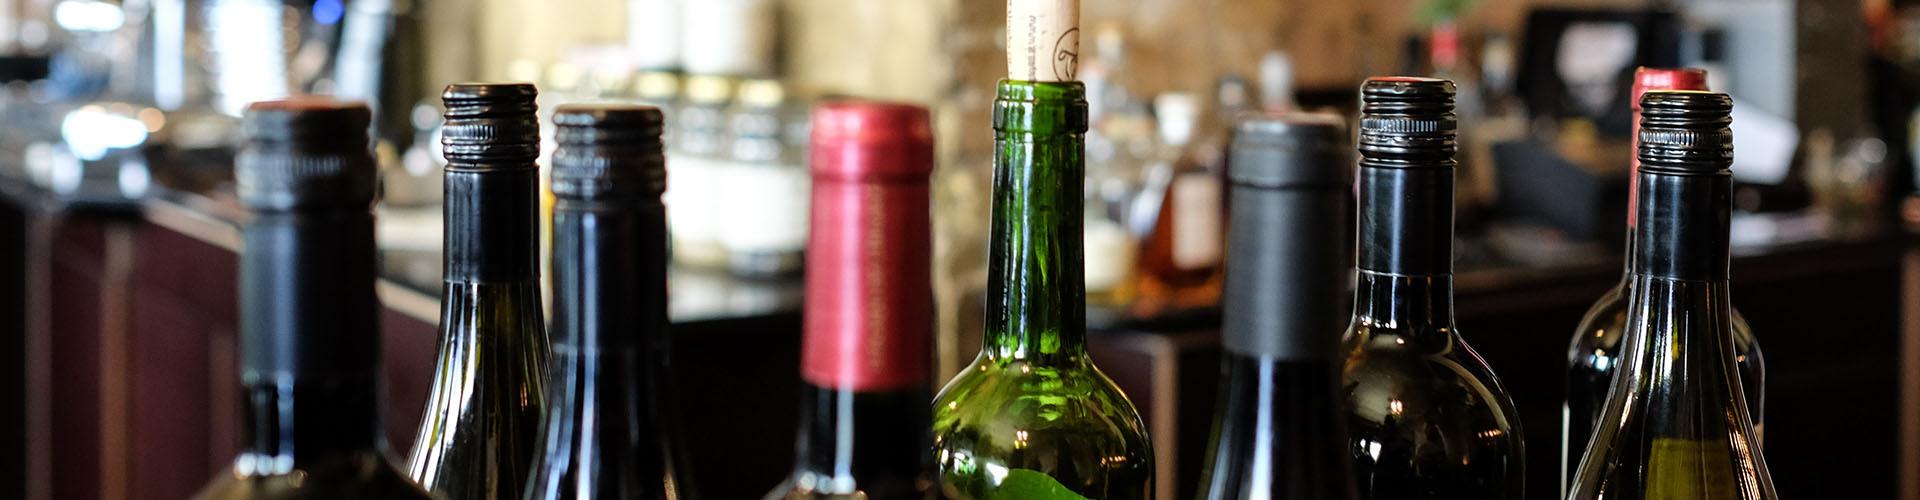 Dixon's Favorites: Top 5 Wine Bars